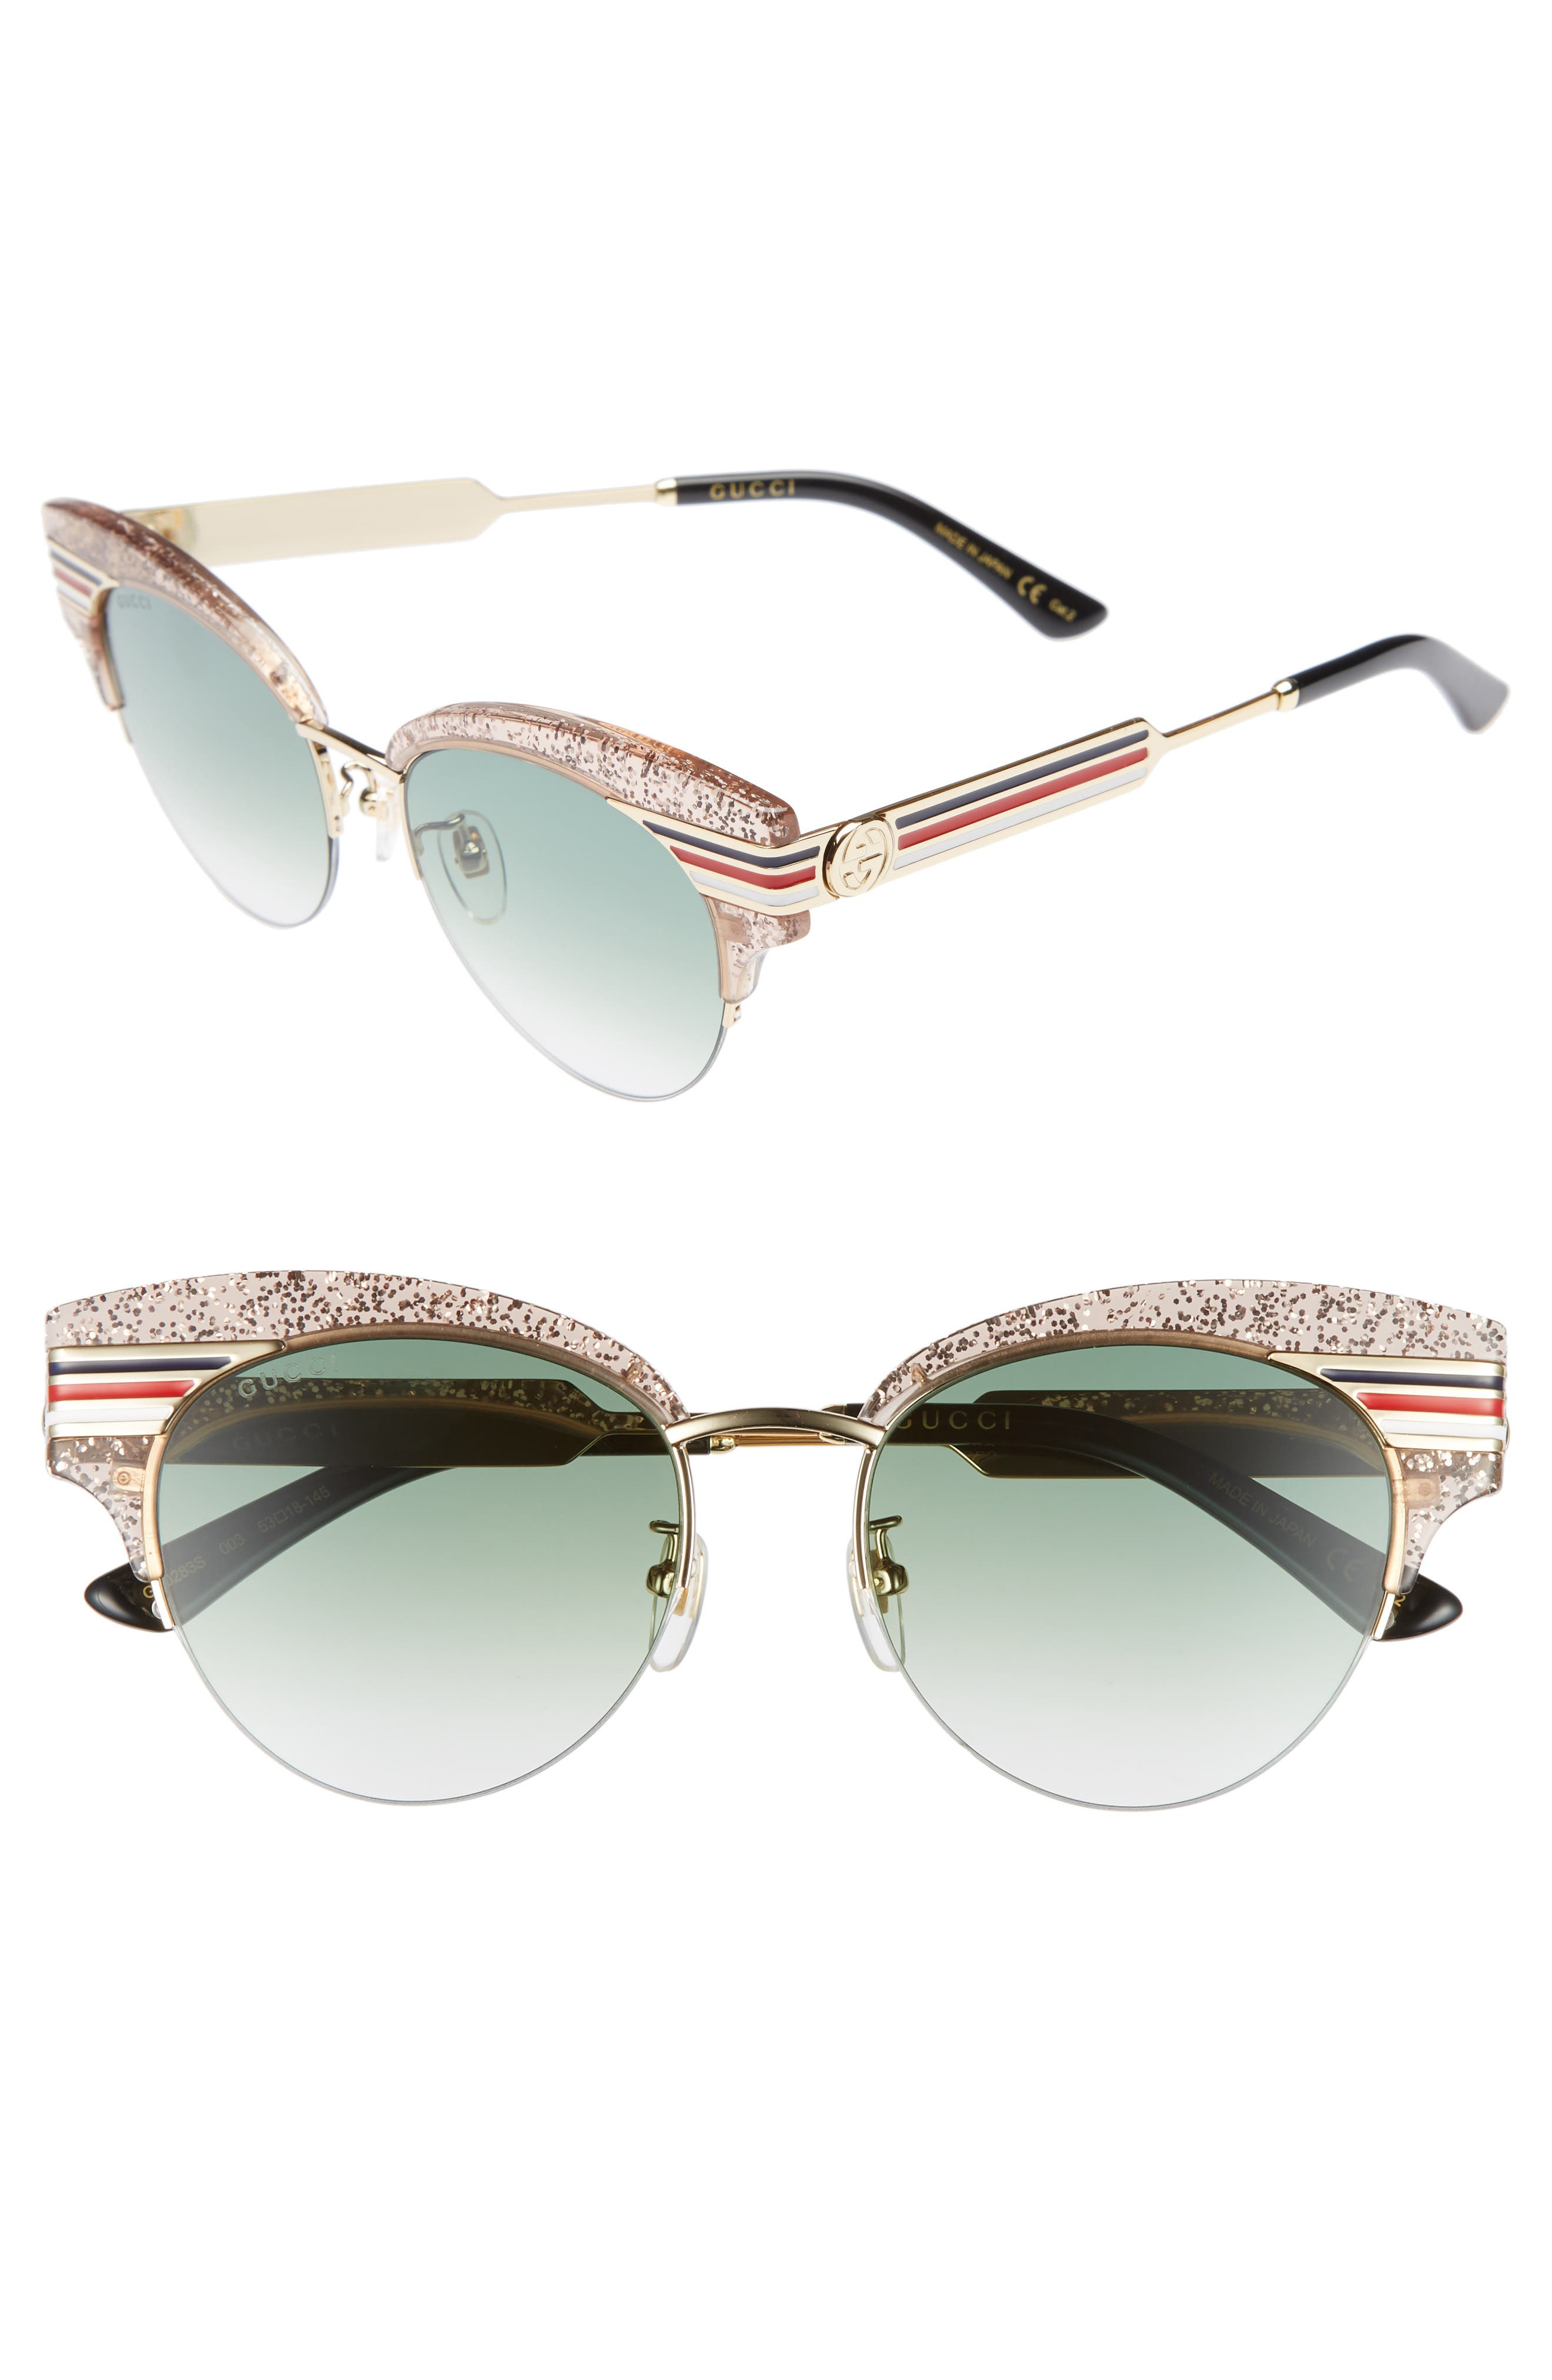 53mm Cat Eye Sunglasses,                             Main thumbnail 1, color,                             NUDE/ GOLD/ BLACK